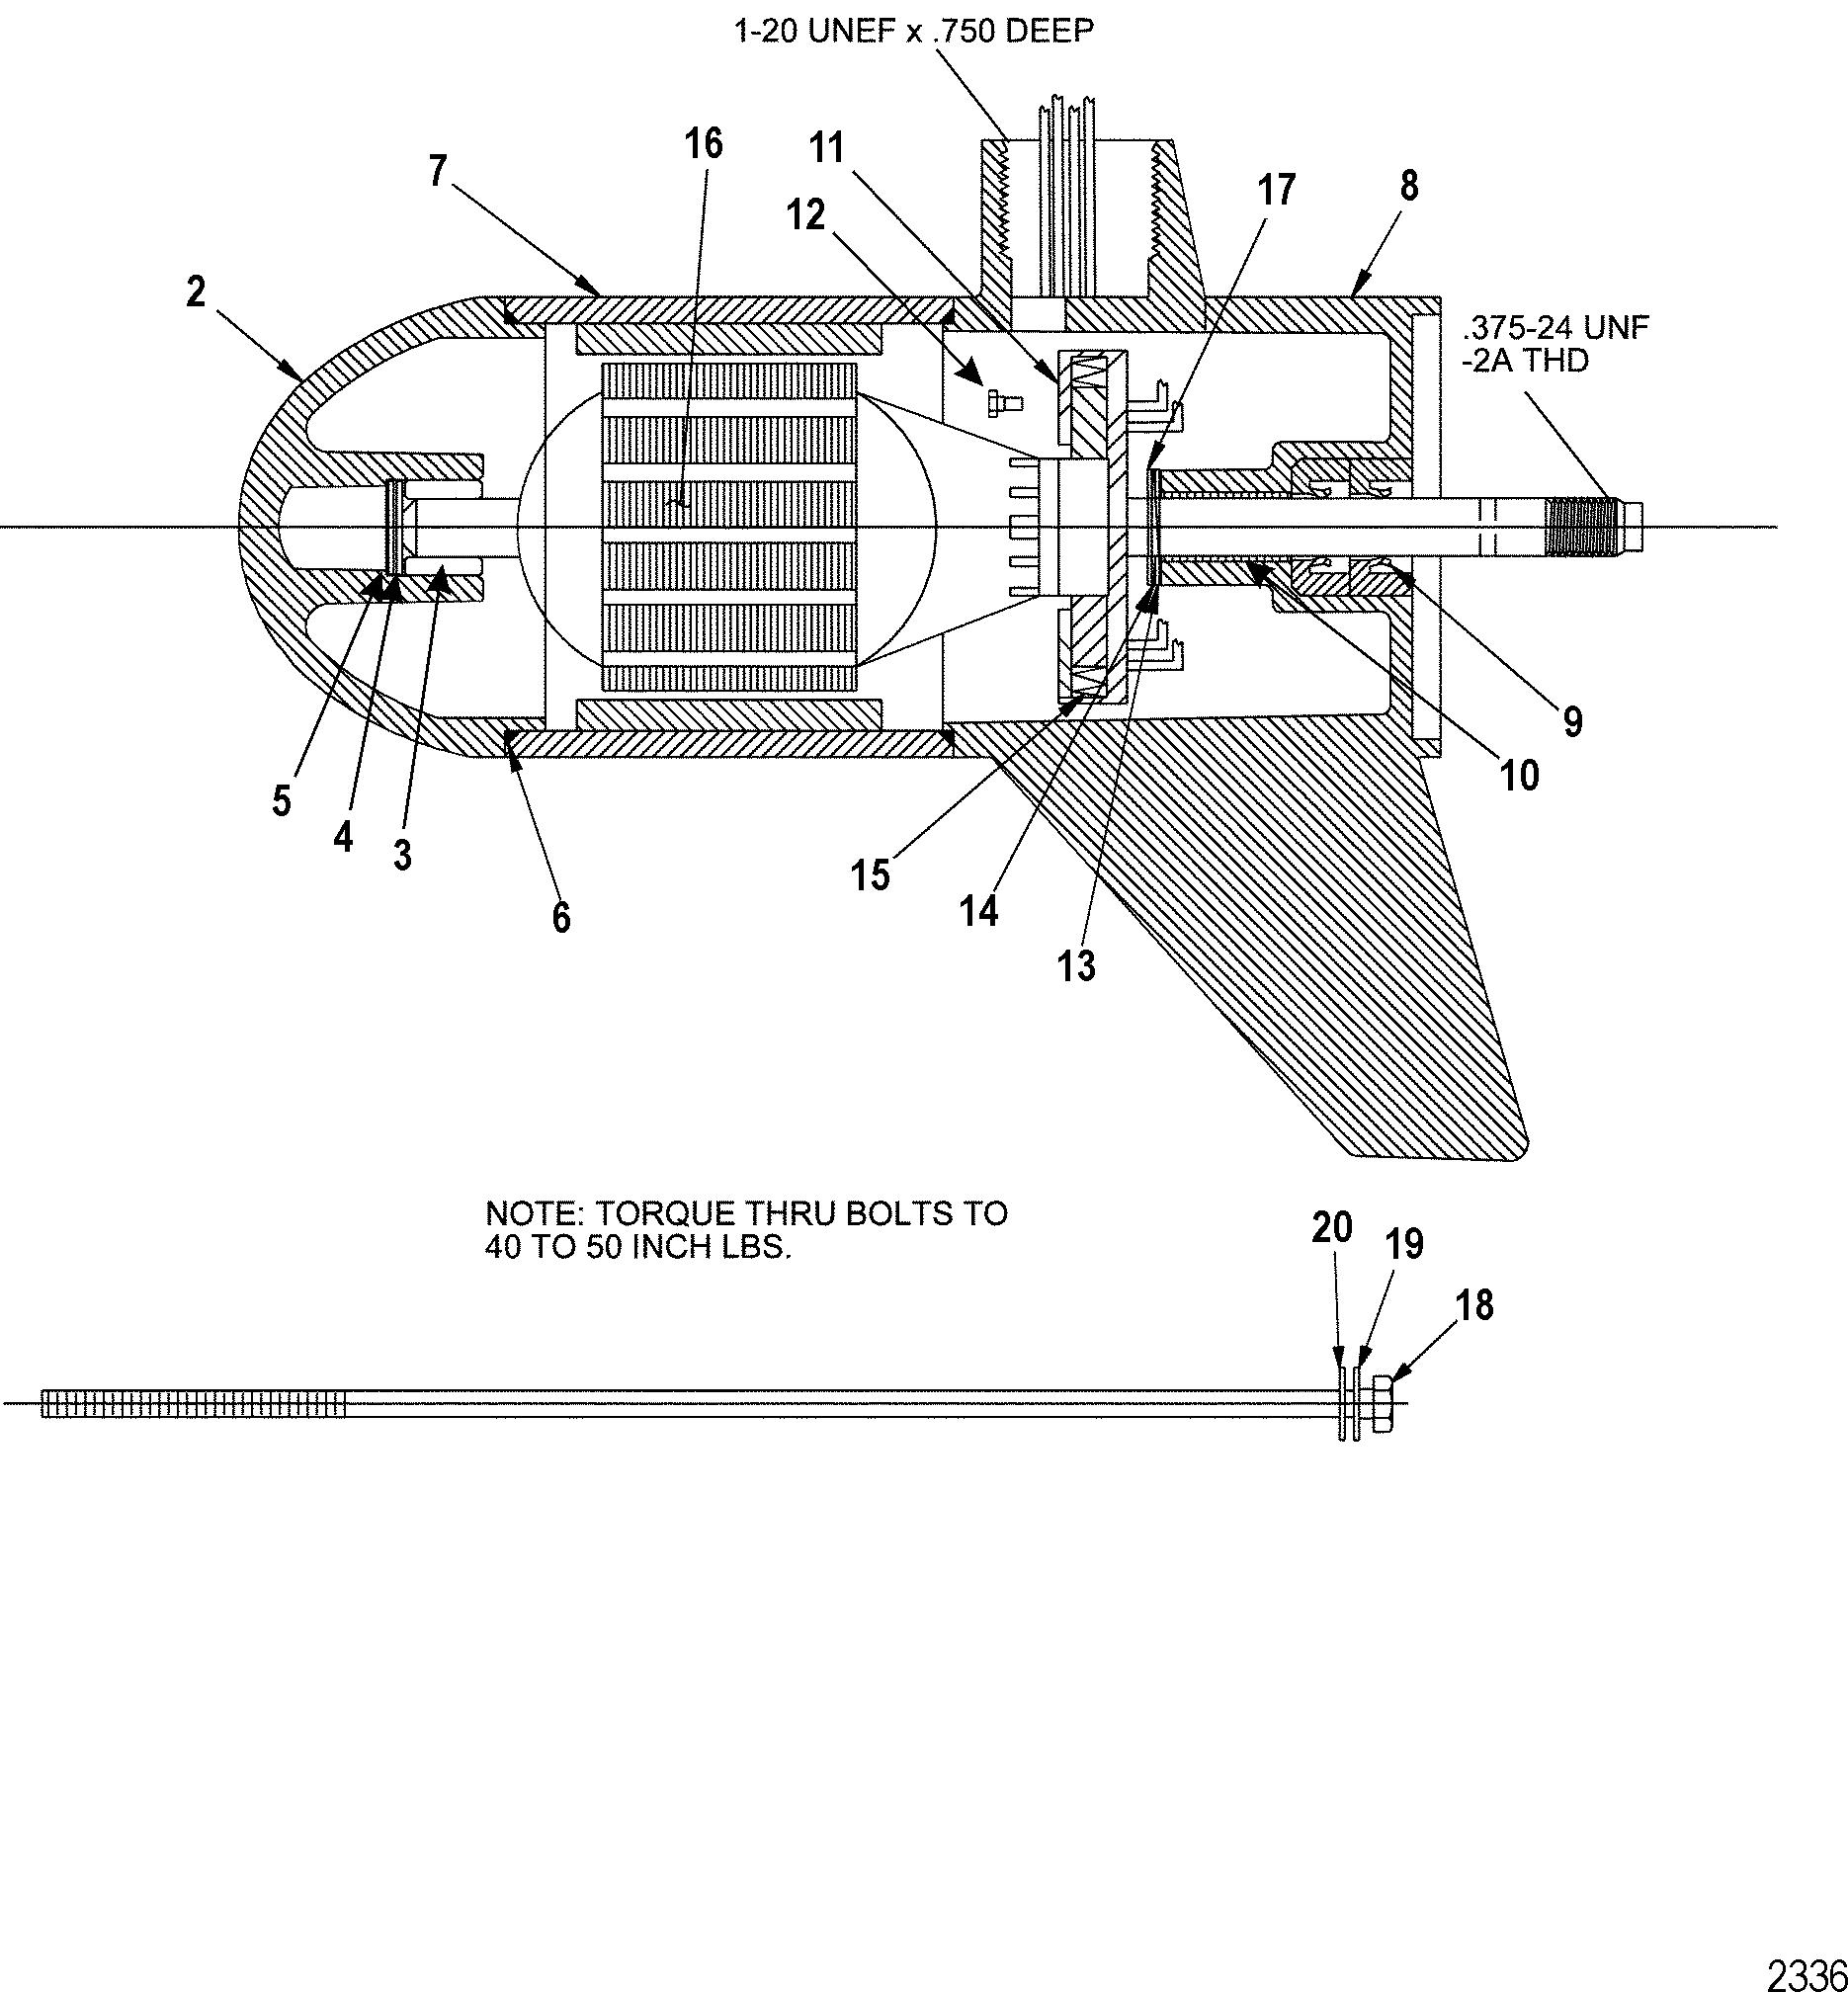 wiring diagram motorguide thruster 30 Wiring Diagrams And Schematics – Motorguide Trolling Motor Wiring Diagram